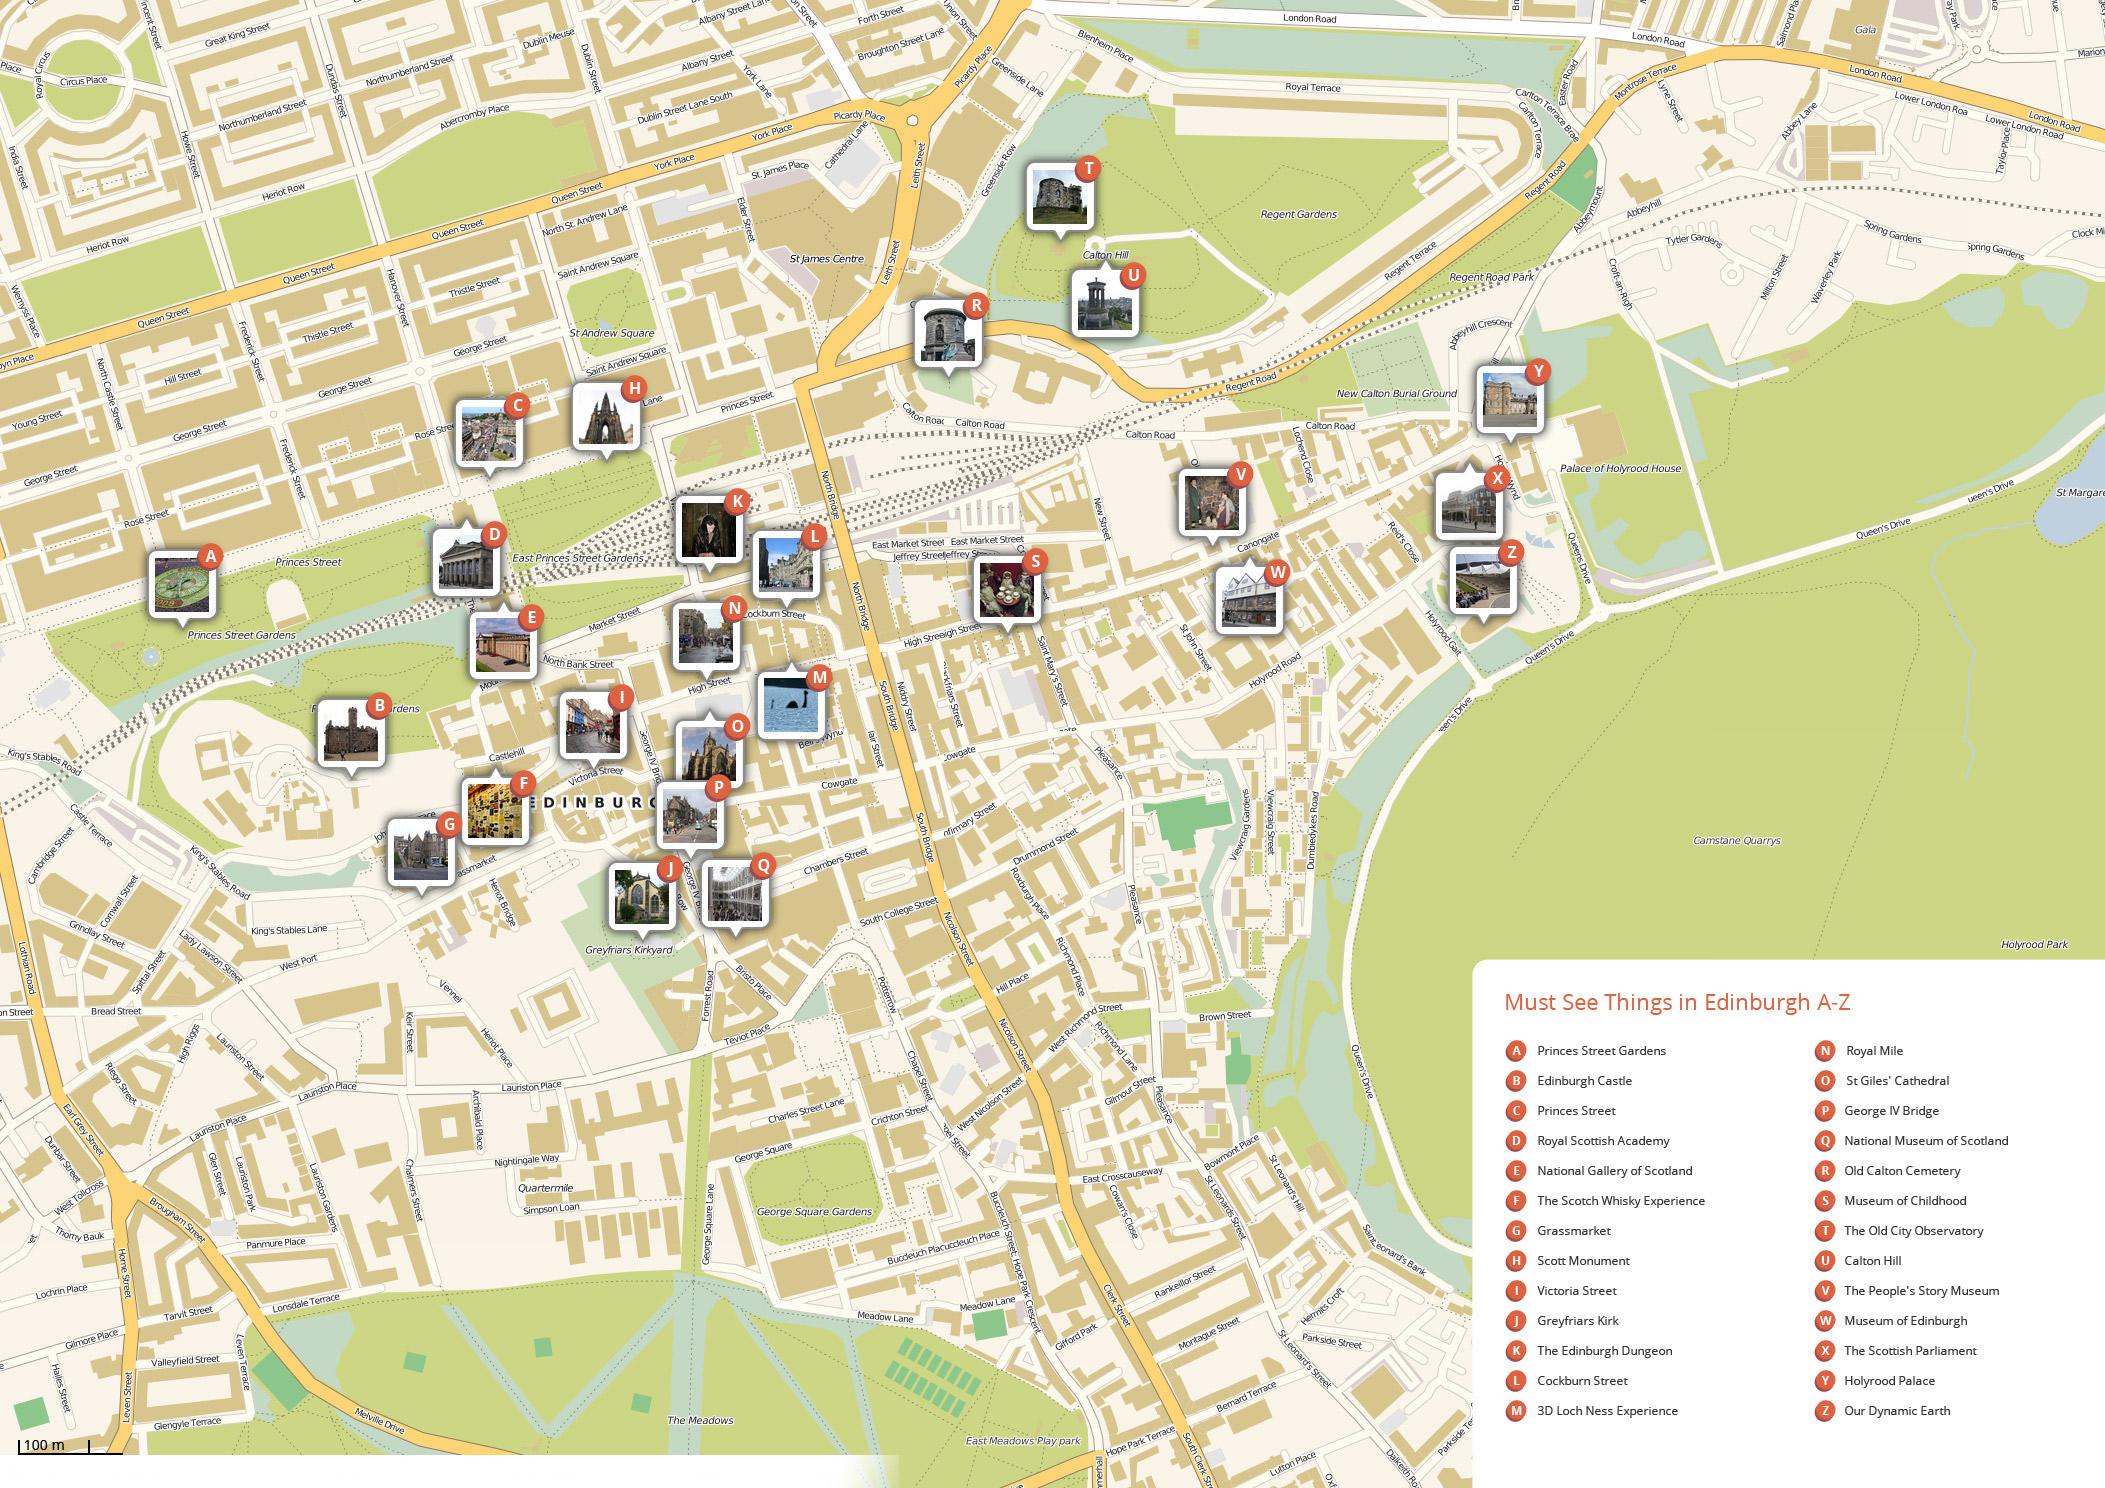 Edinburgh Attractions Map PDF - FREE Printable Tourist Map